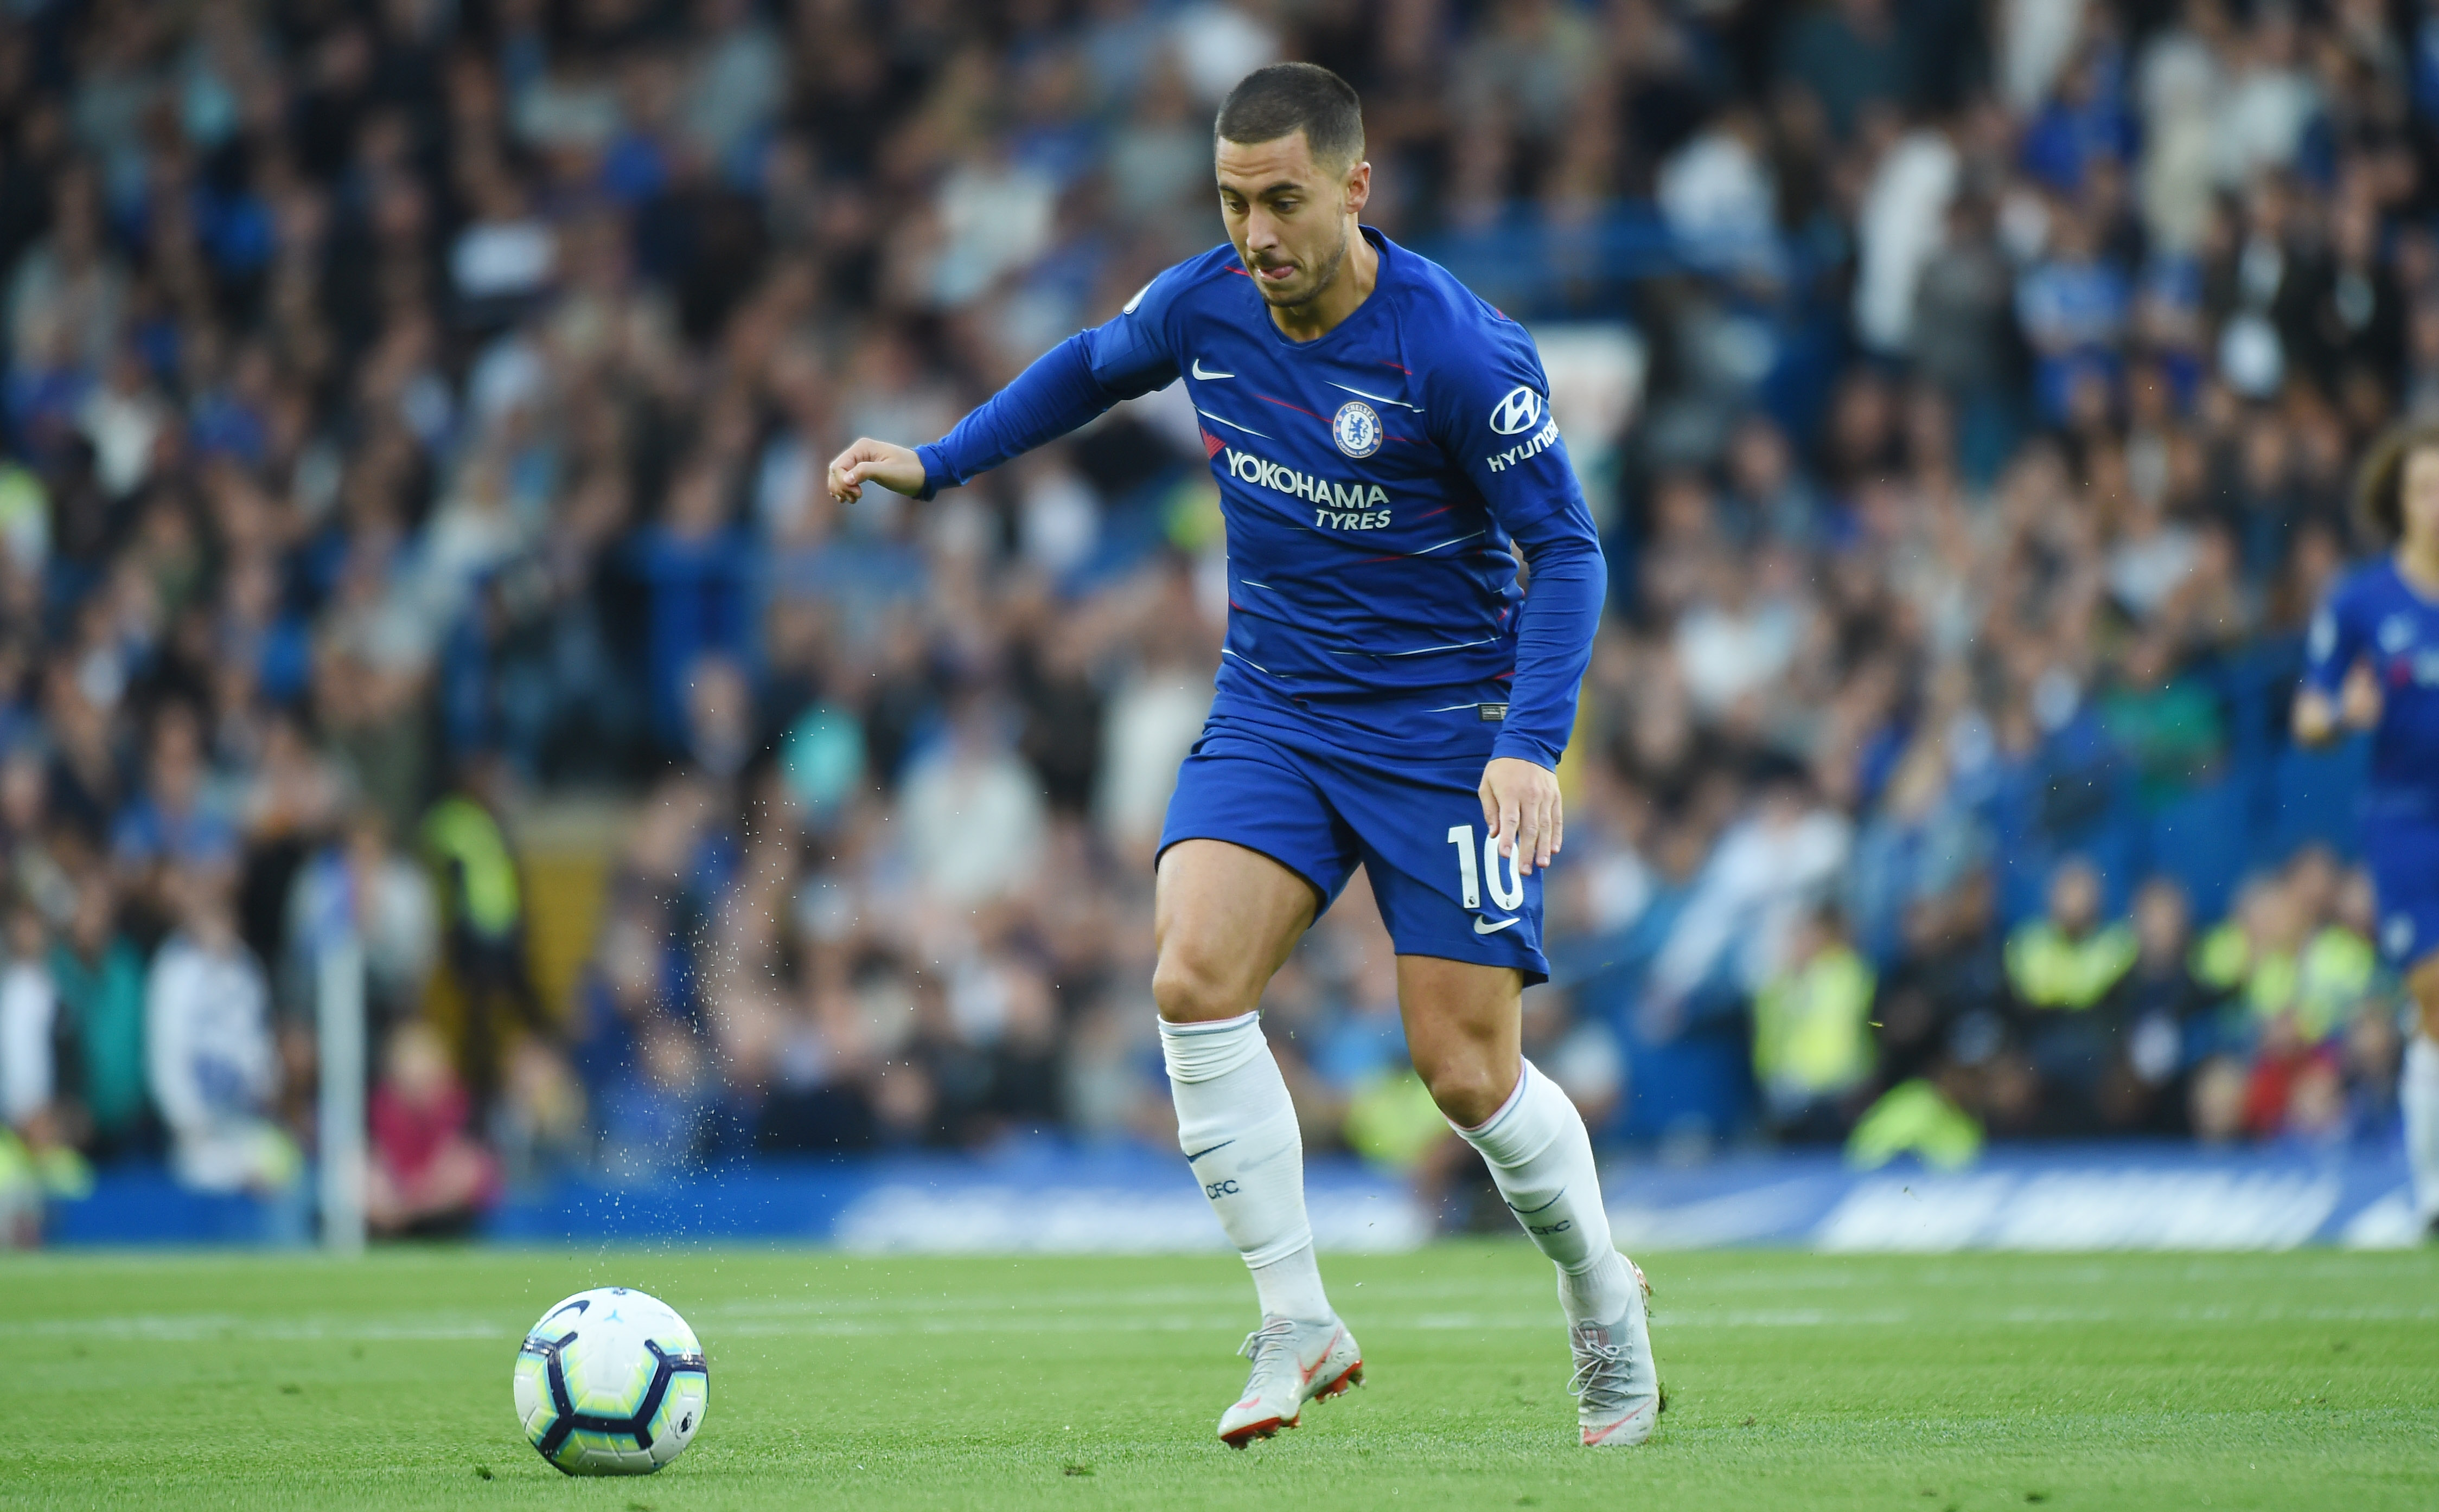 Football - Etranger - Premier League: Burnley-Chelsea en direct